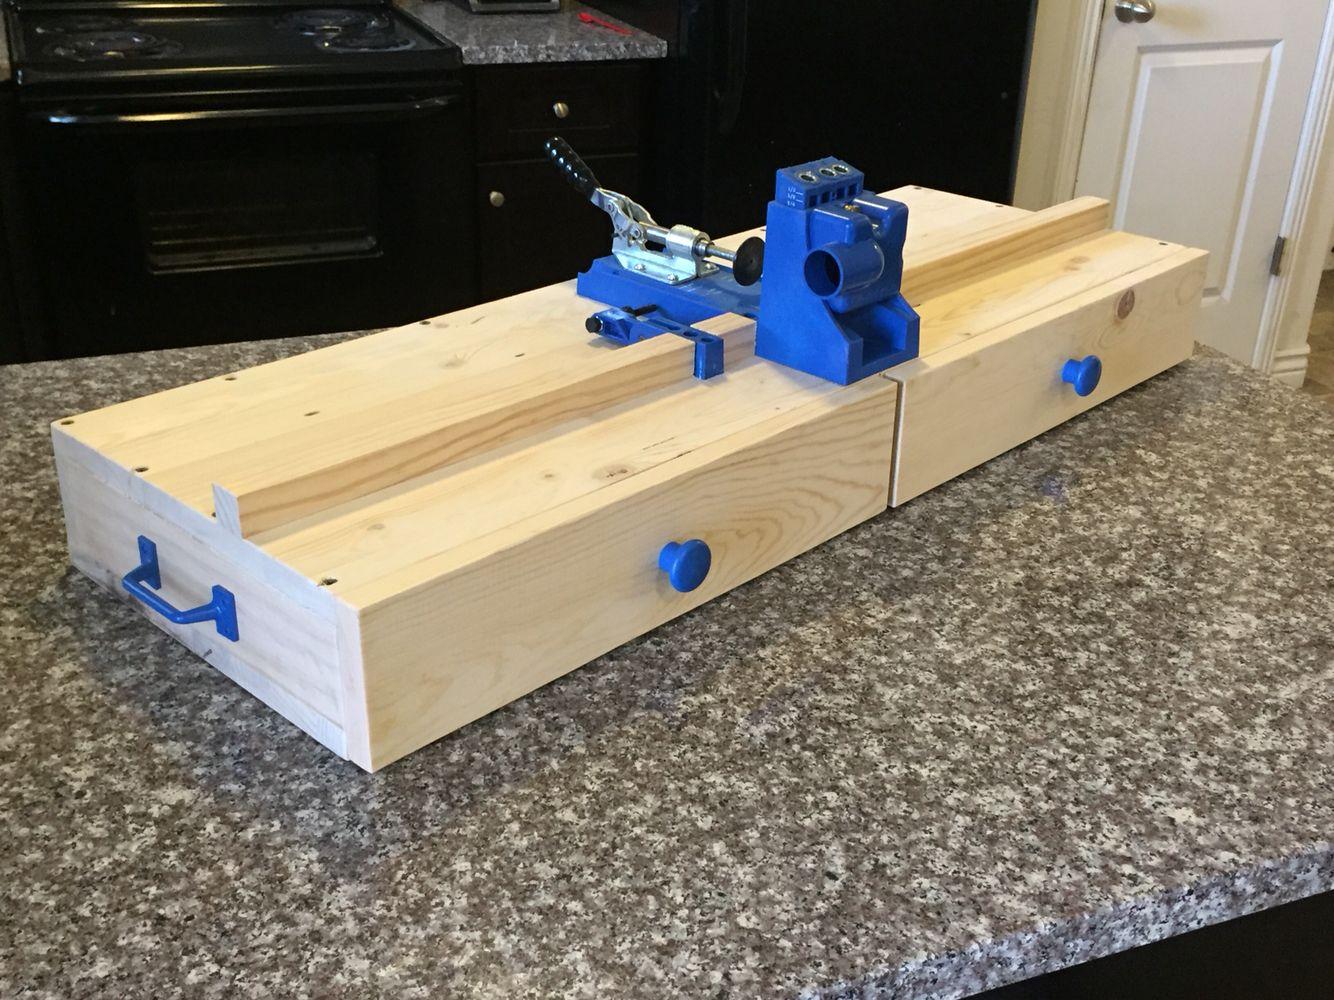 My Kreg Jig Work Station Woodworking Wood Shop Projects Kreg